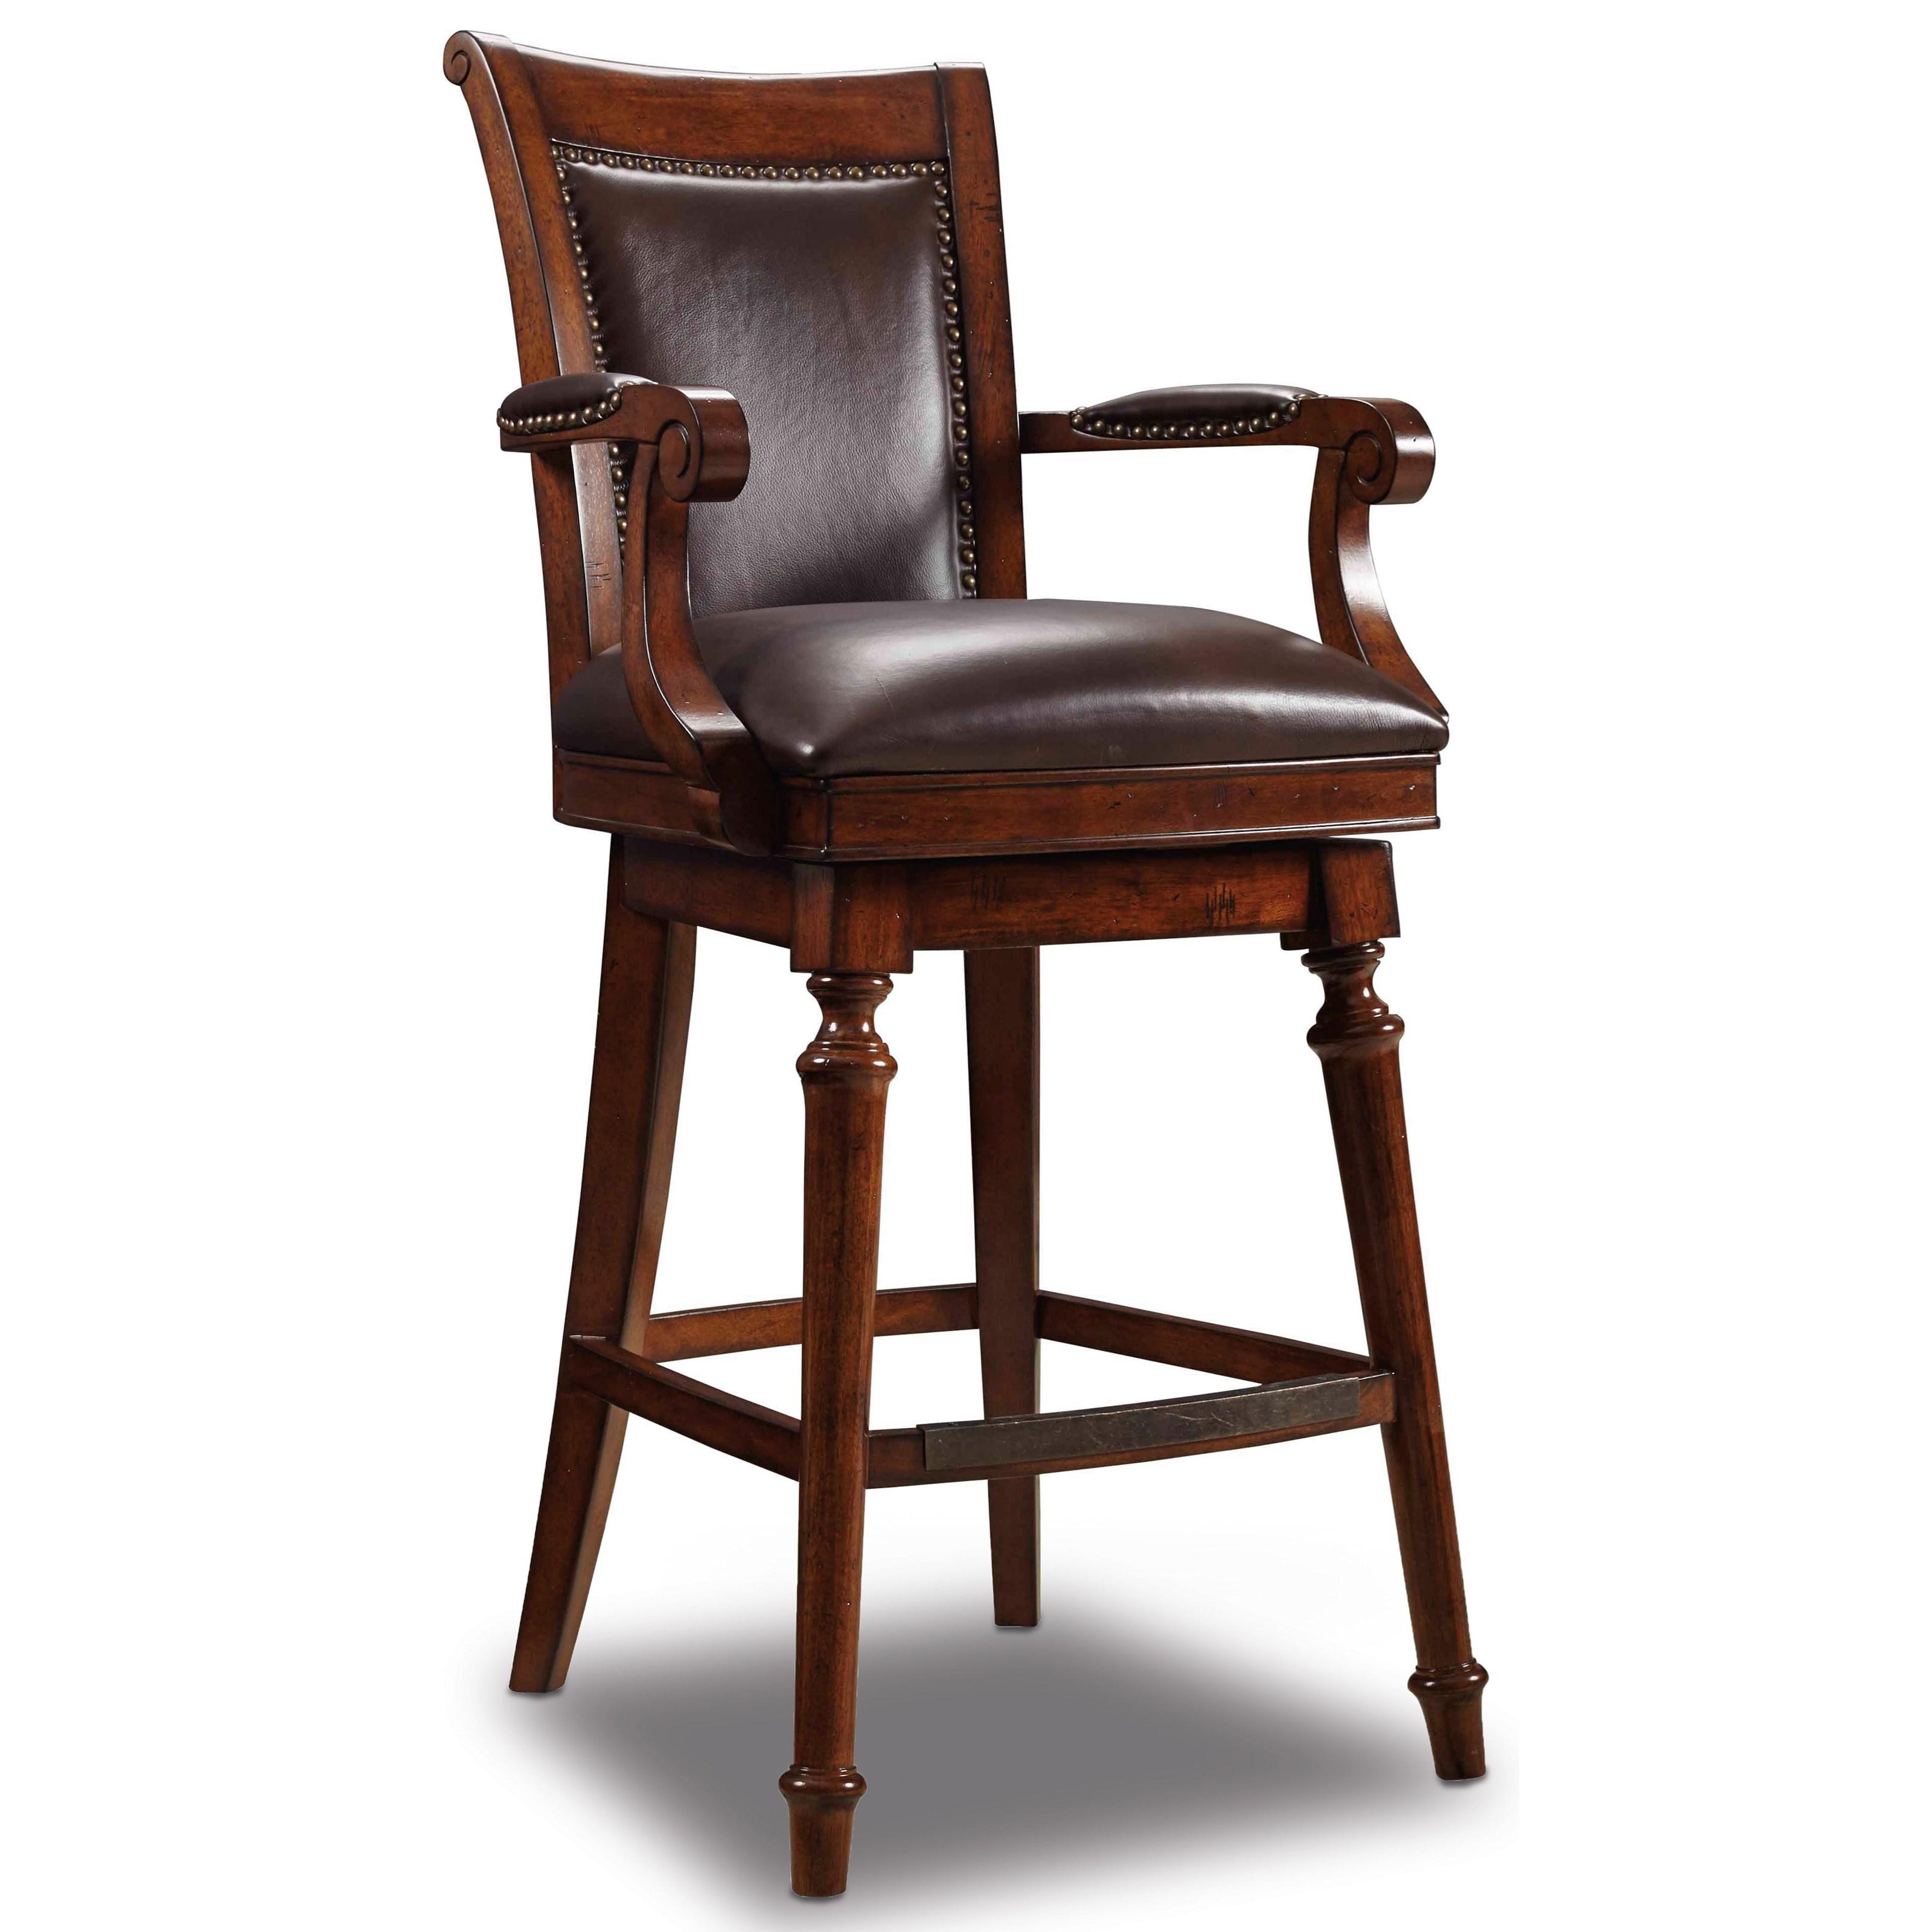 Stools Dark Merlot Barstool by Hooker Furniture at Miller Waldrop Furniture and Decor